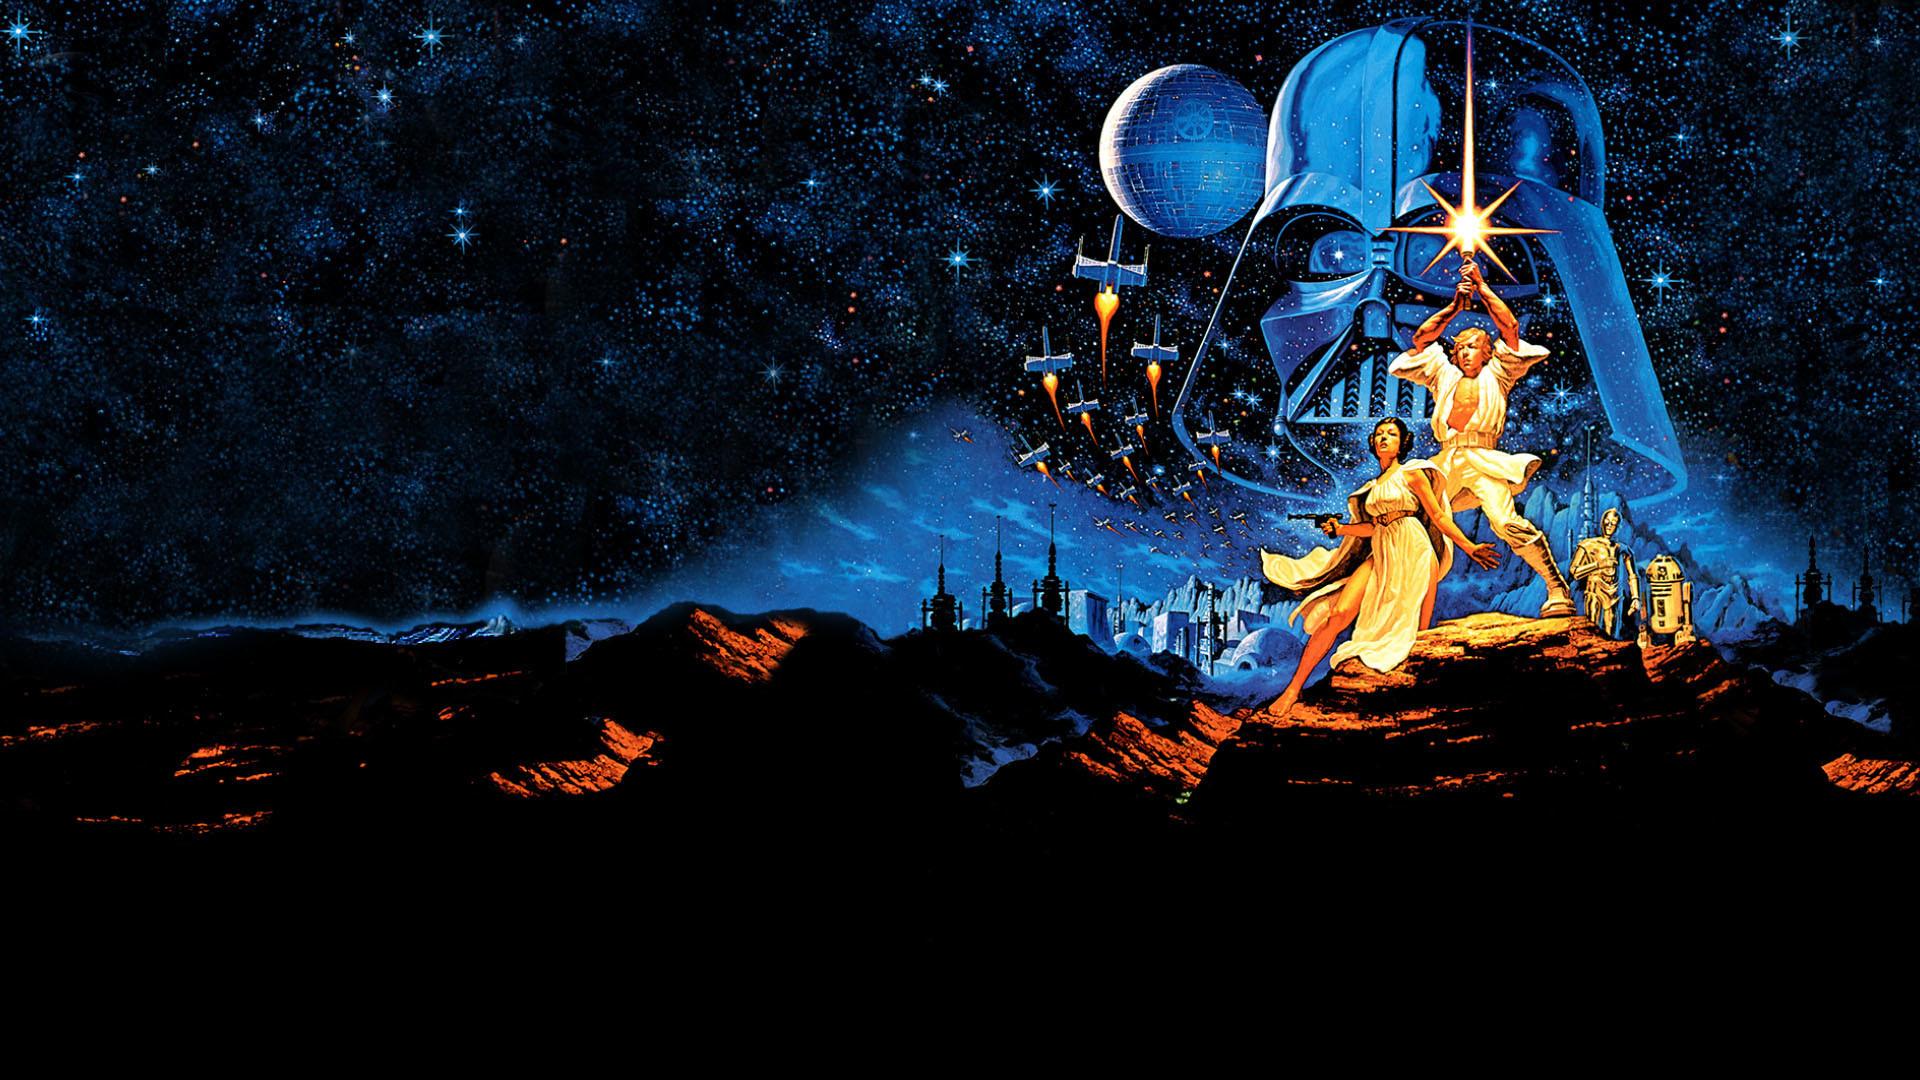 High Res Star Wars Wallpaper 71 Images